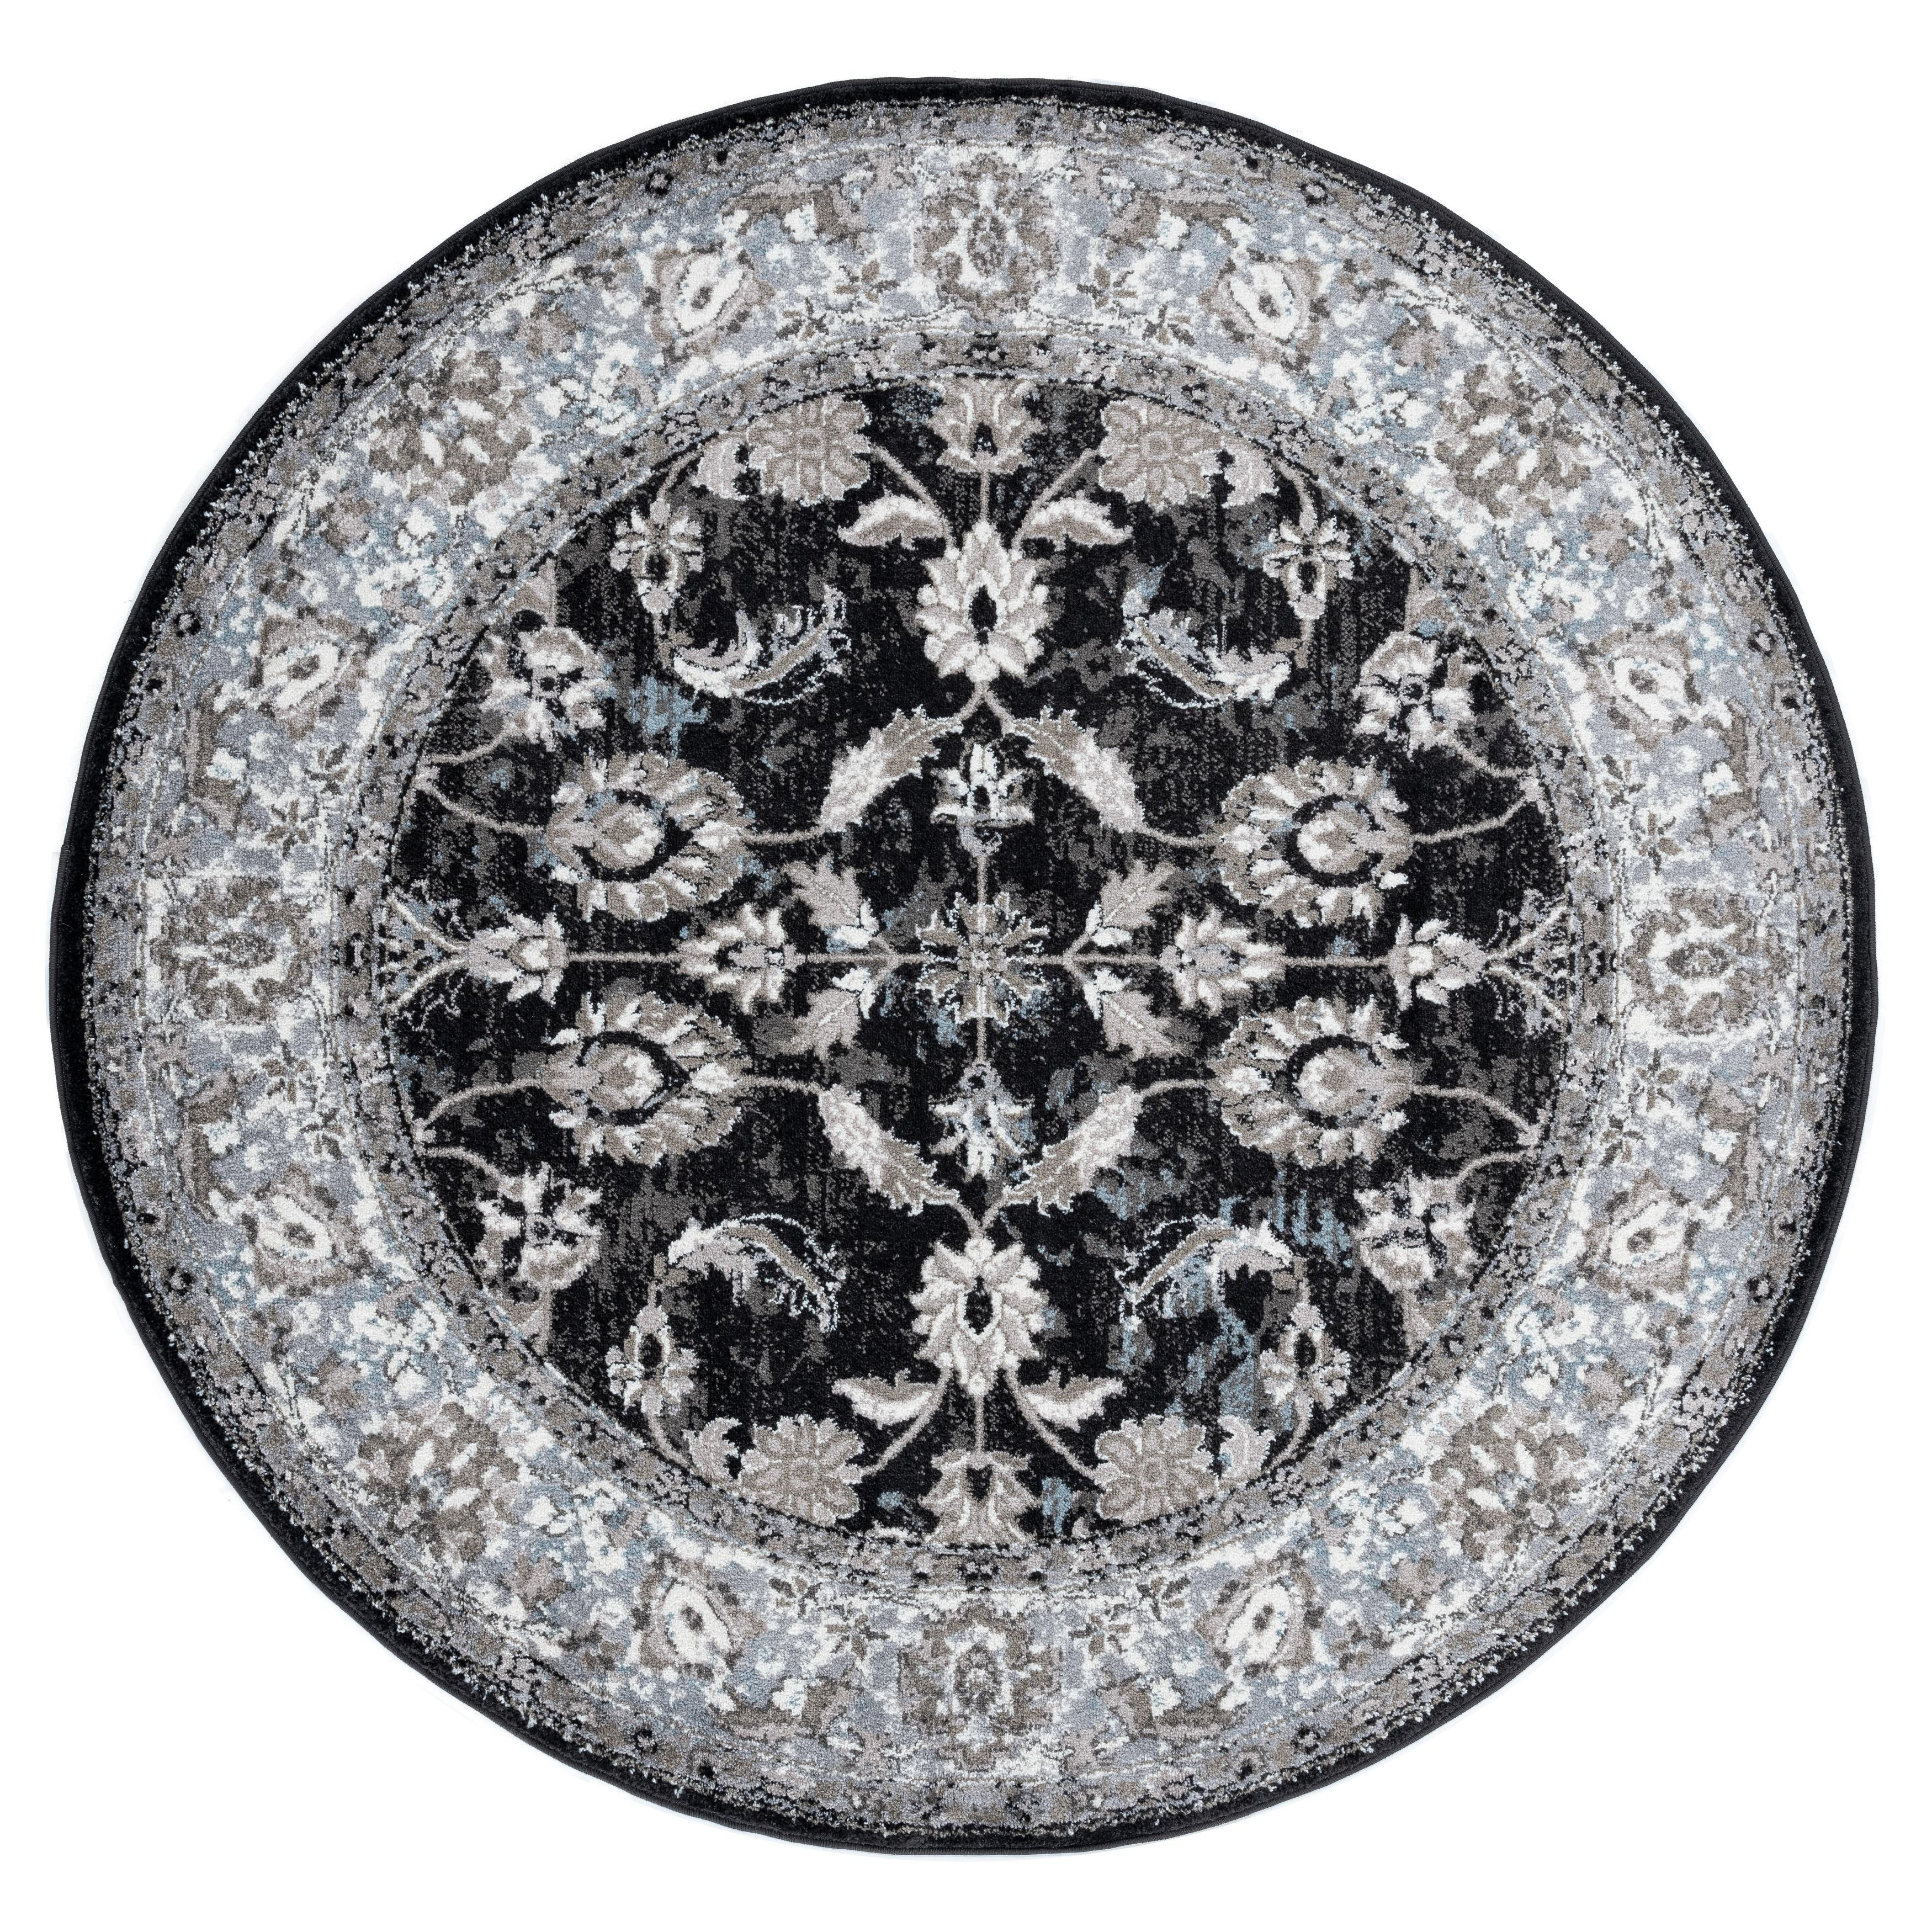 Aurelia Wilton-woven Transitional Black Round Rug - 6 x 6 (Black - 6 x 6)